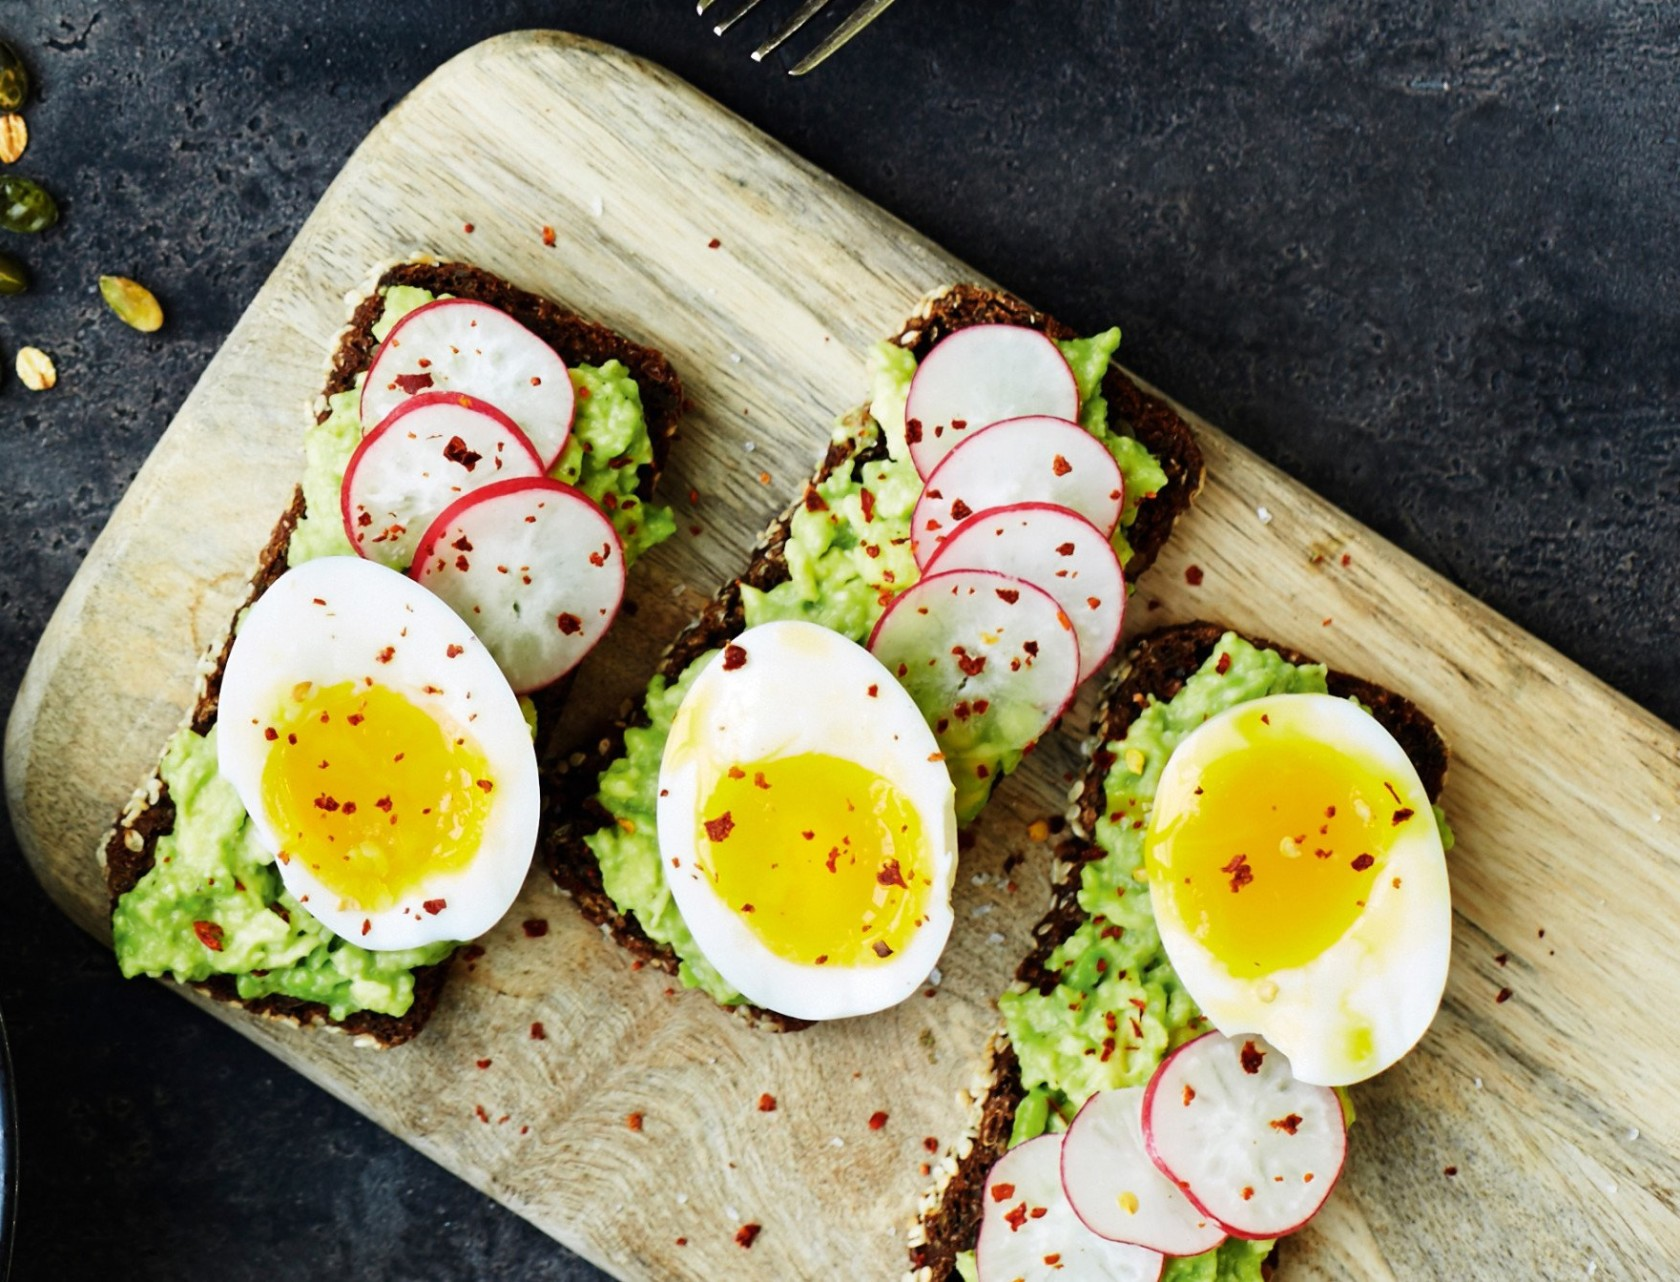 Avocadomadder med æg og chiliflager - perfekt frokost opskrift!